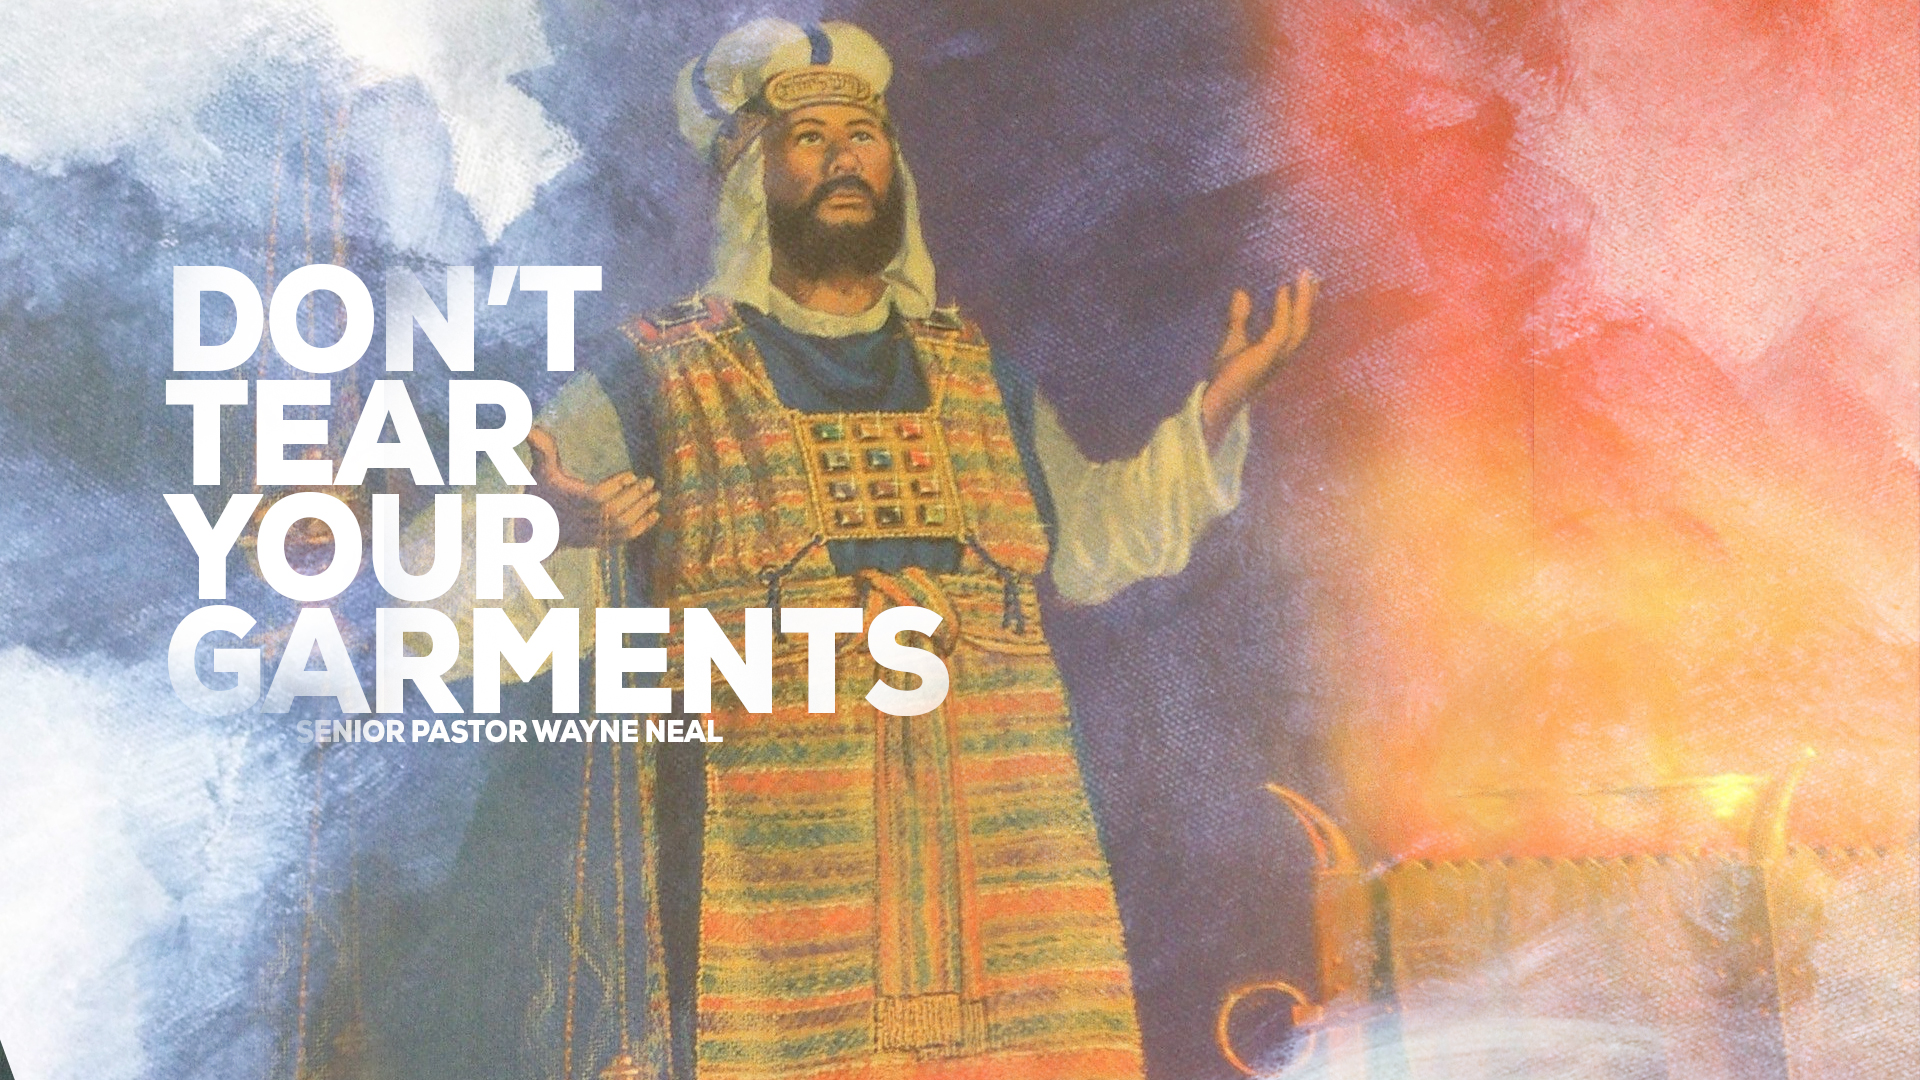 Don't-Tear-Your-Garments-TL.jpg